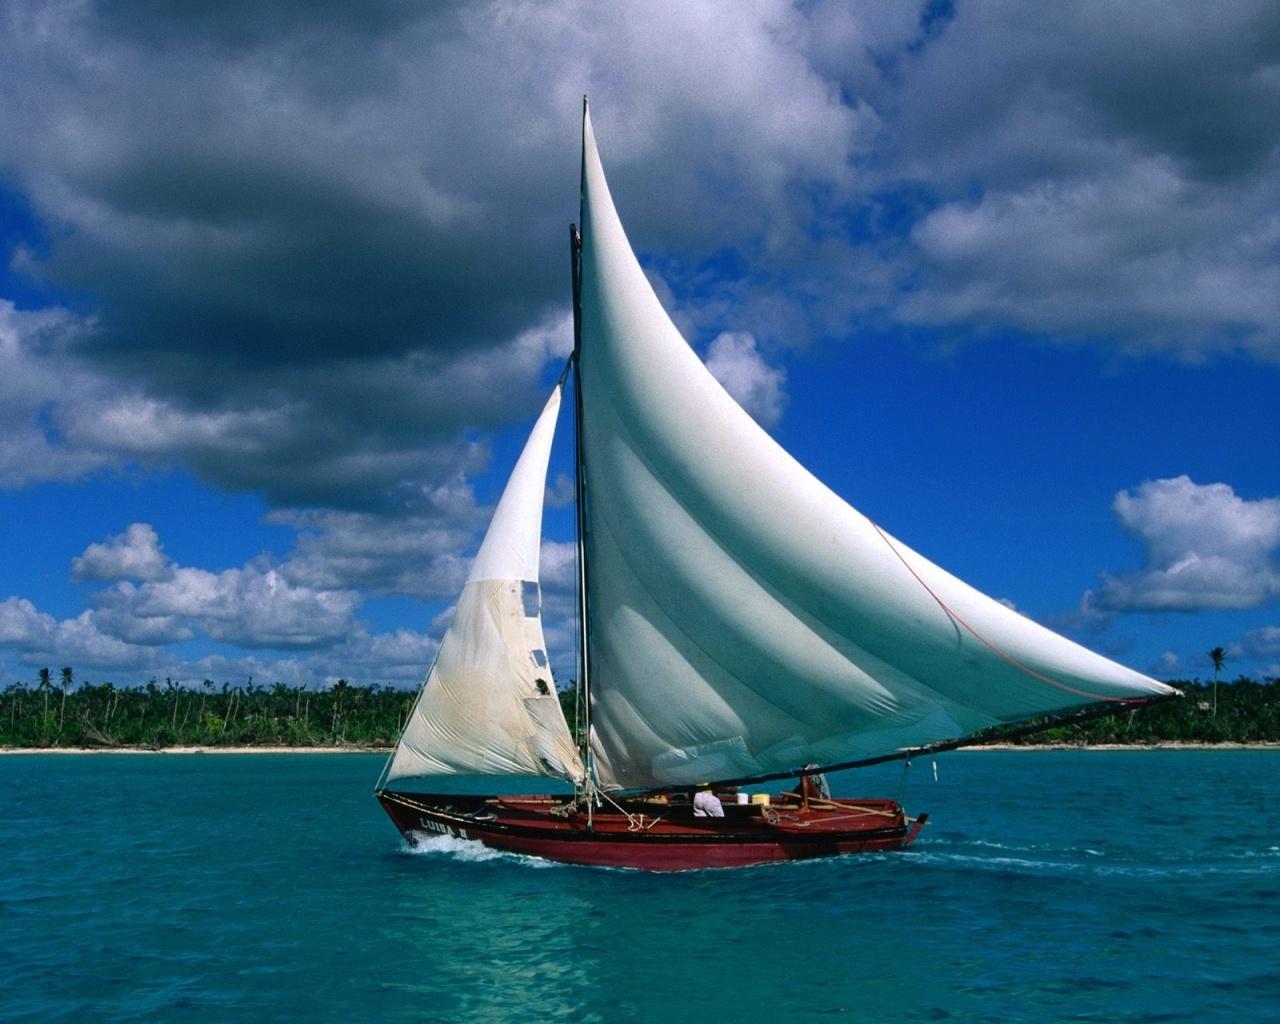 Fishing Sailboat Dominican Republic 1280x1024 pixel Hd Wallpaper 1280x1024